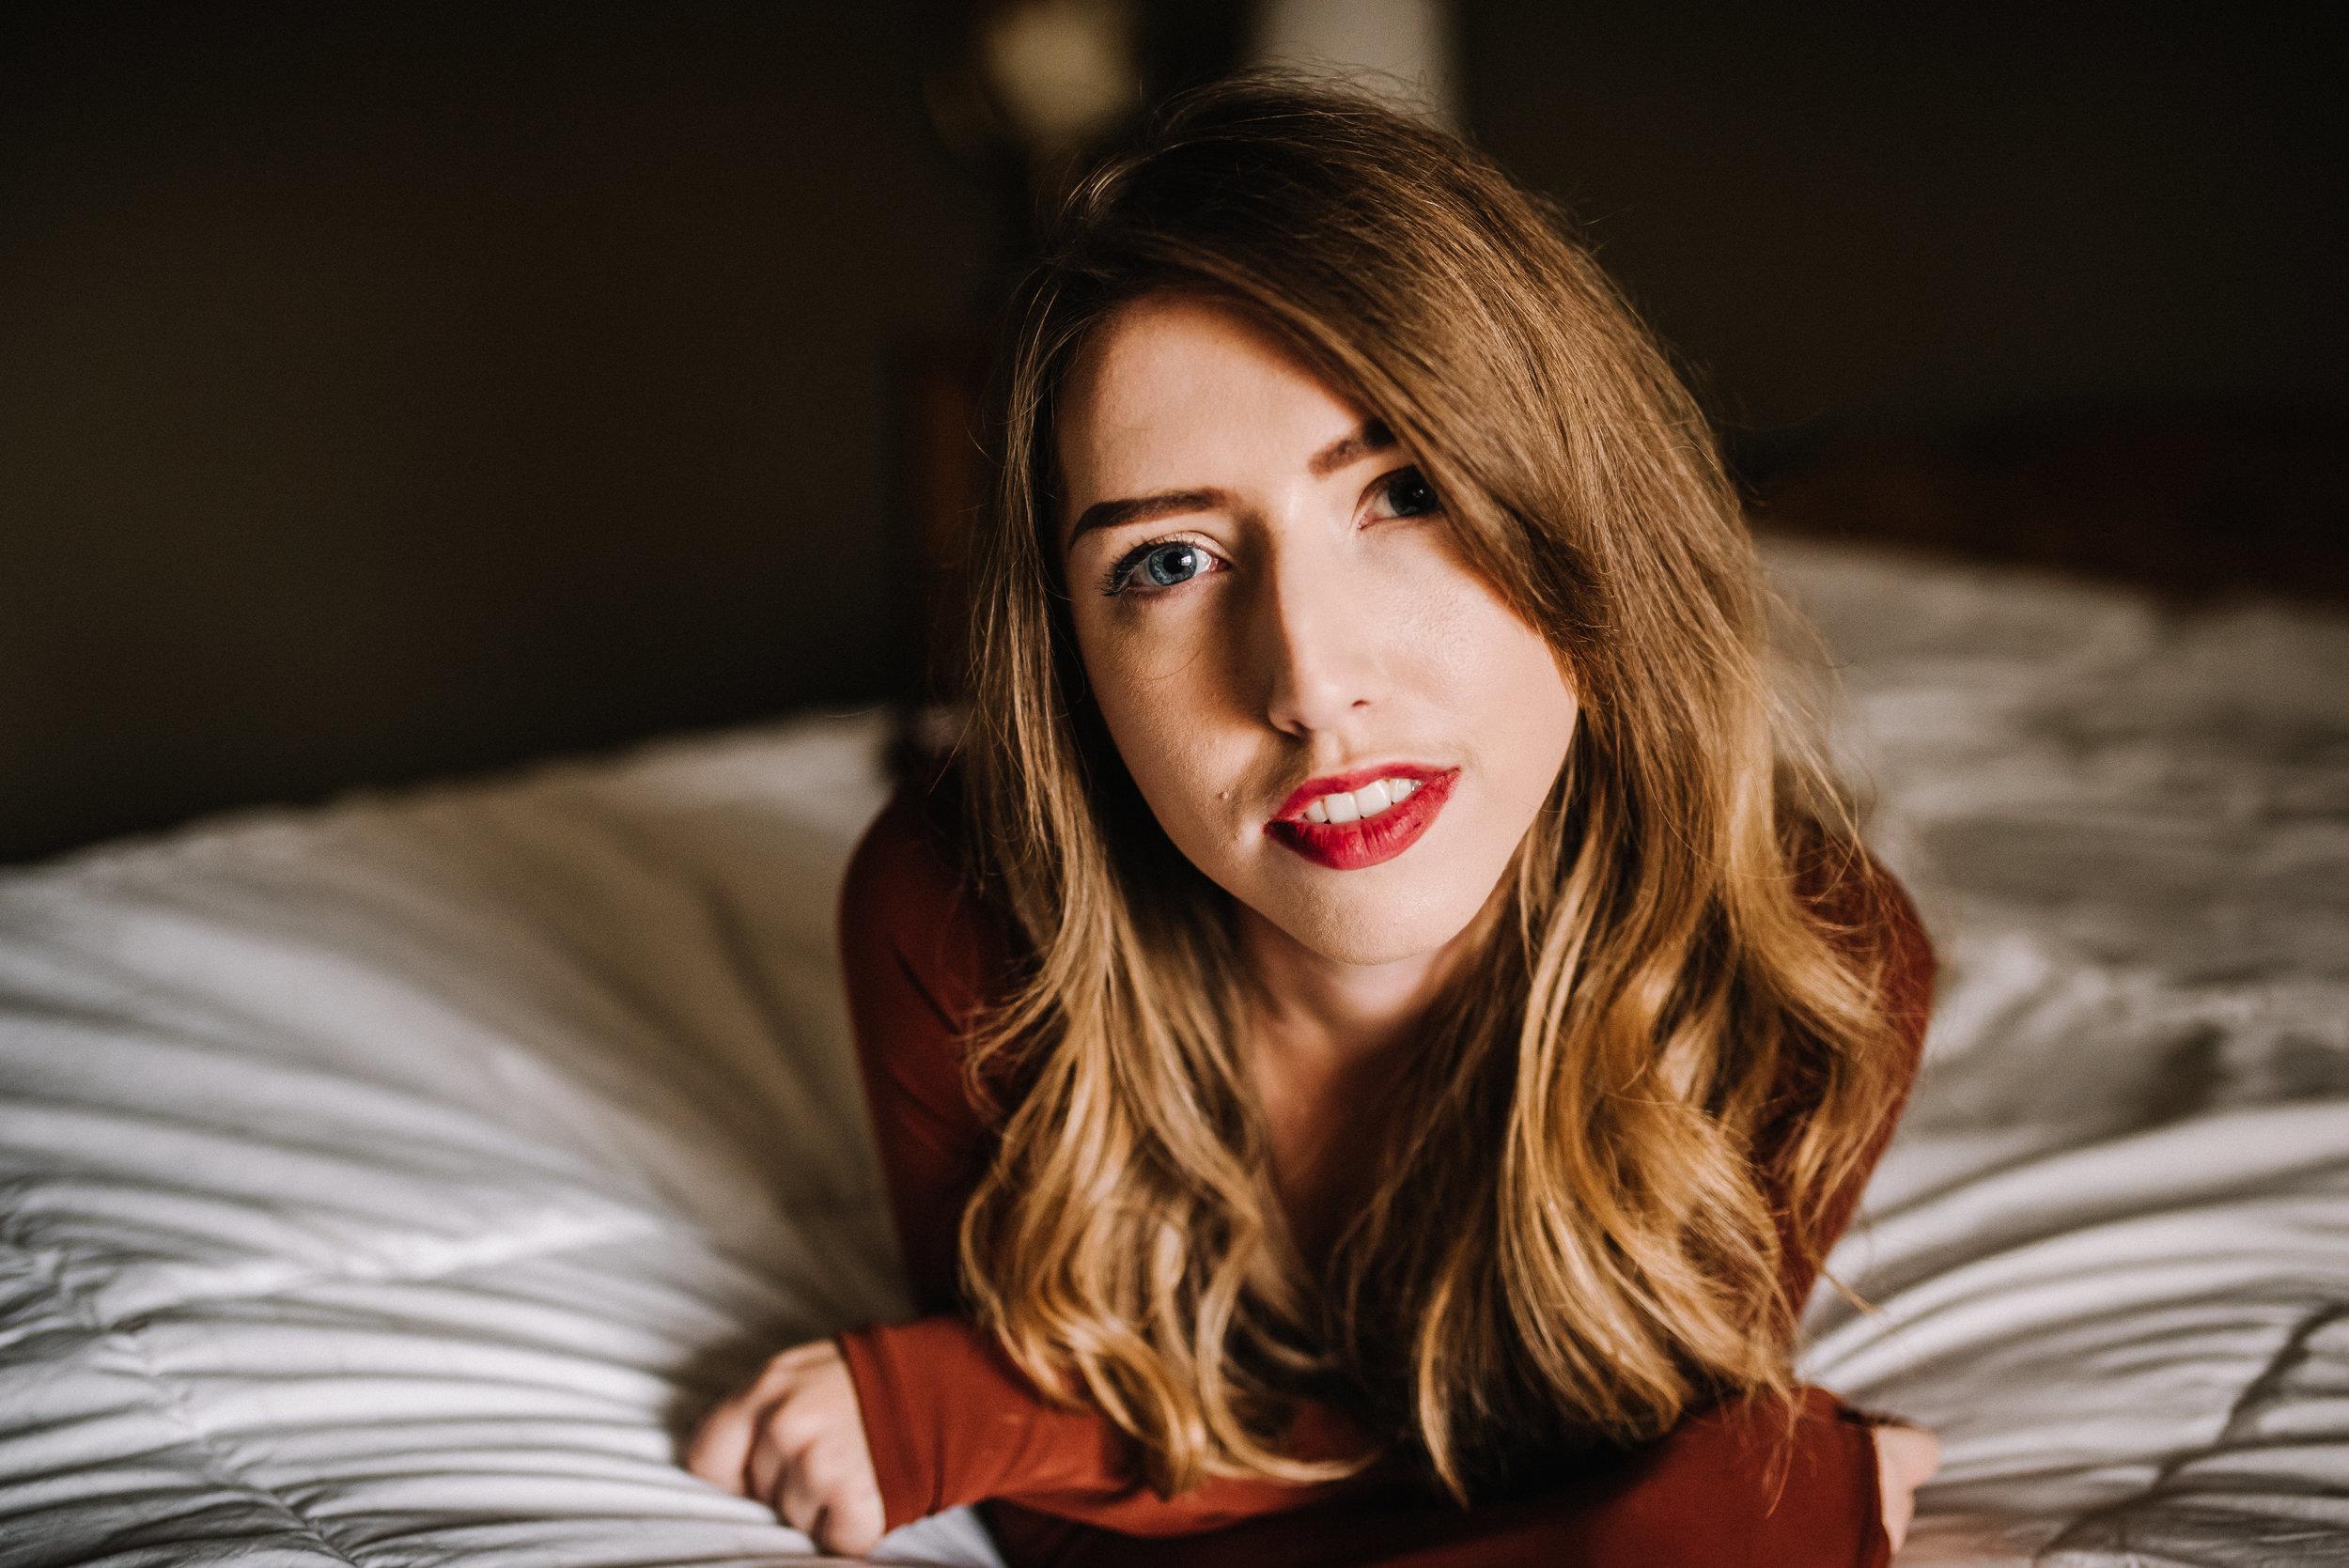 Kaitlyn_Ashley-Benham-Photography-4.jpg